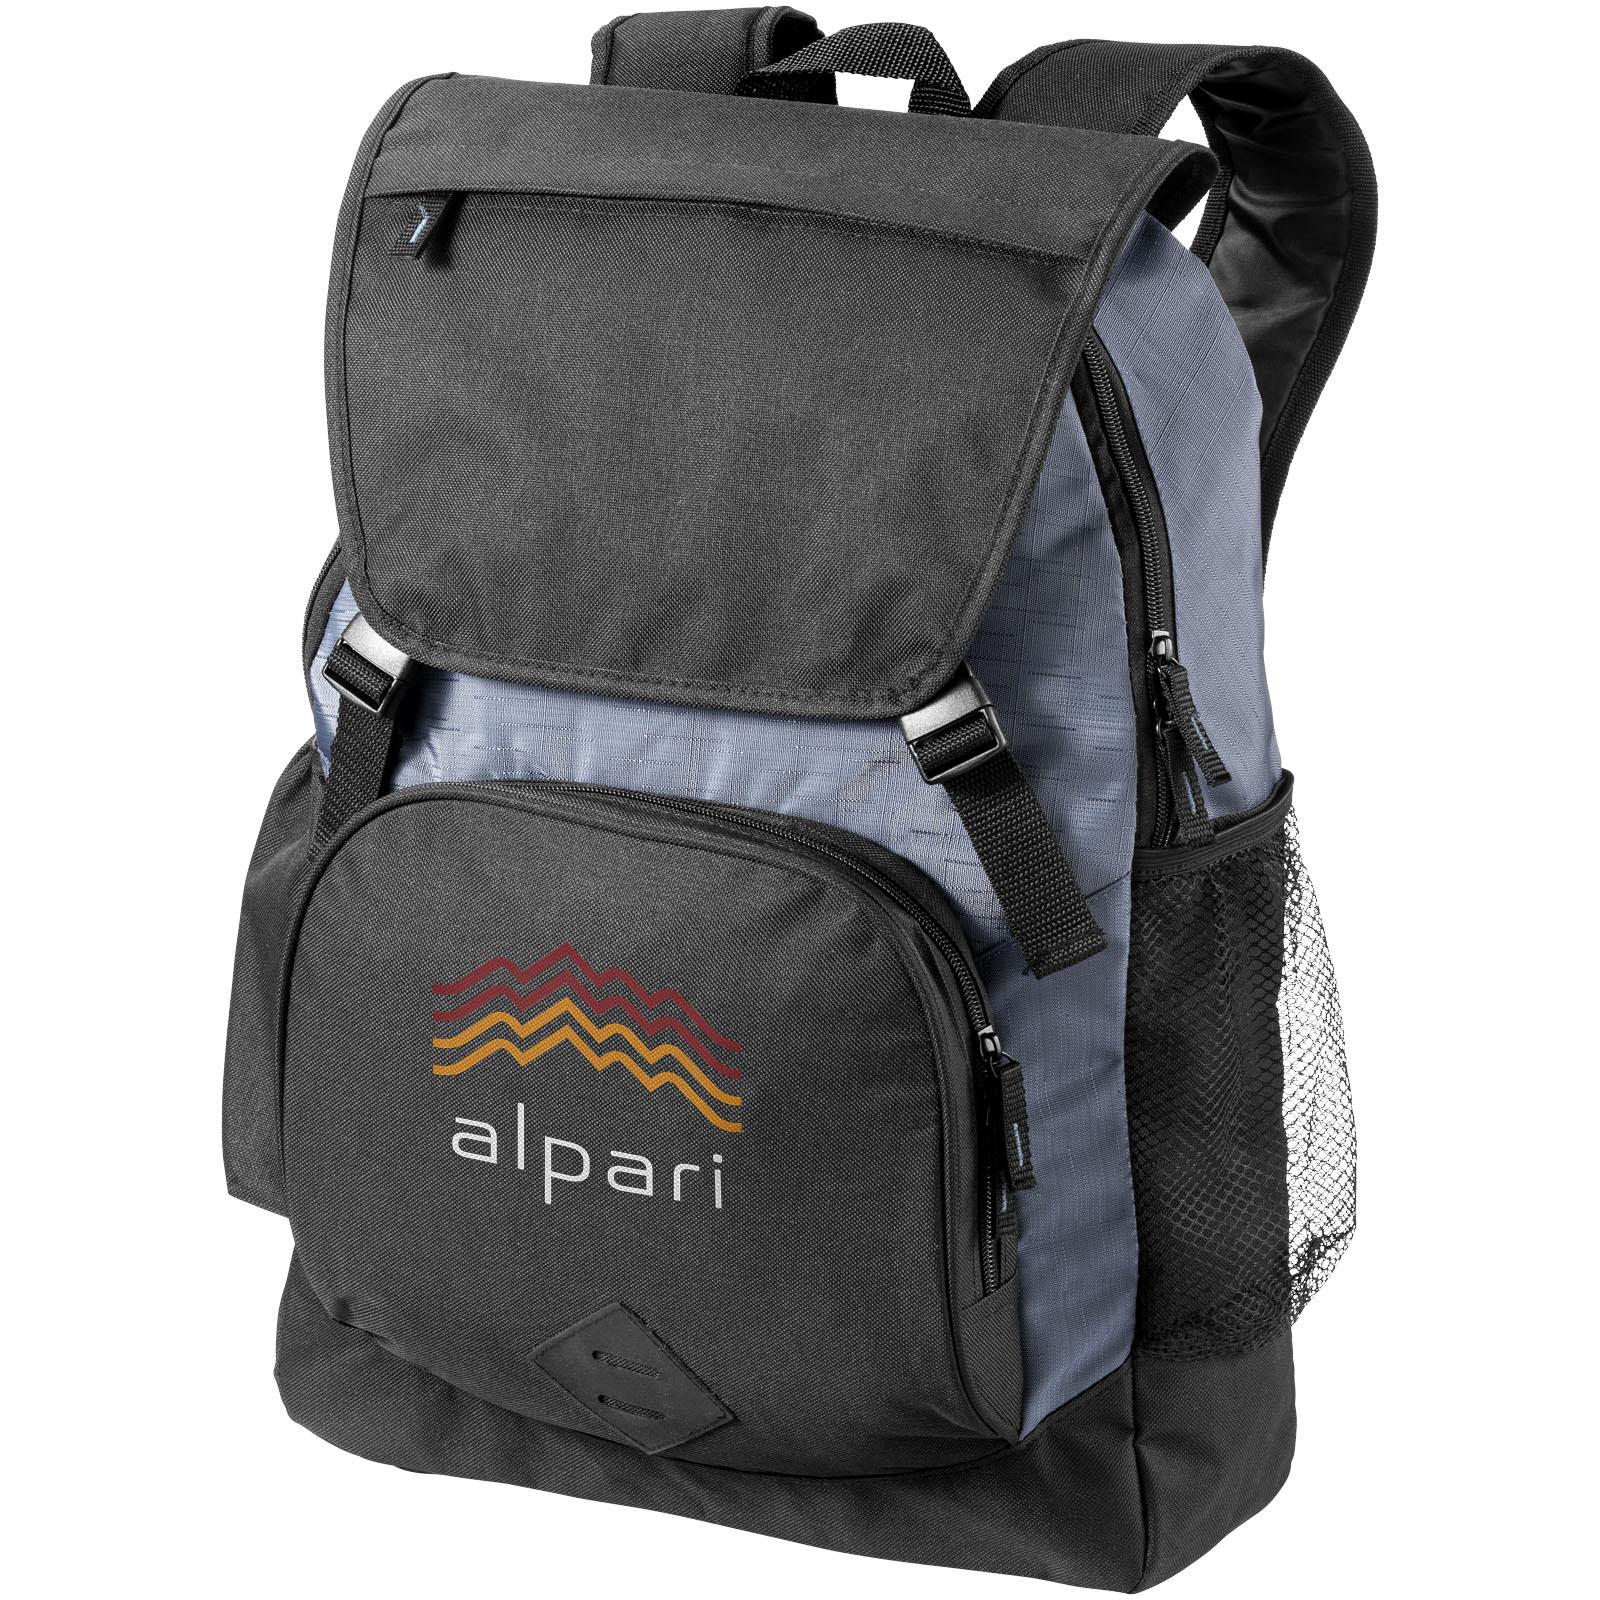 20a638f7ab9 Wellington 17 laptoprugzak backpack bedrukken? - Voordelig & snel ...